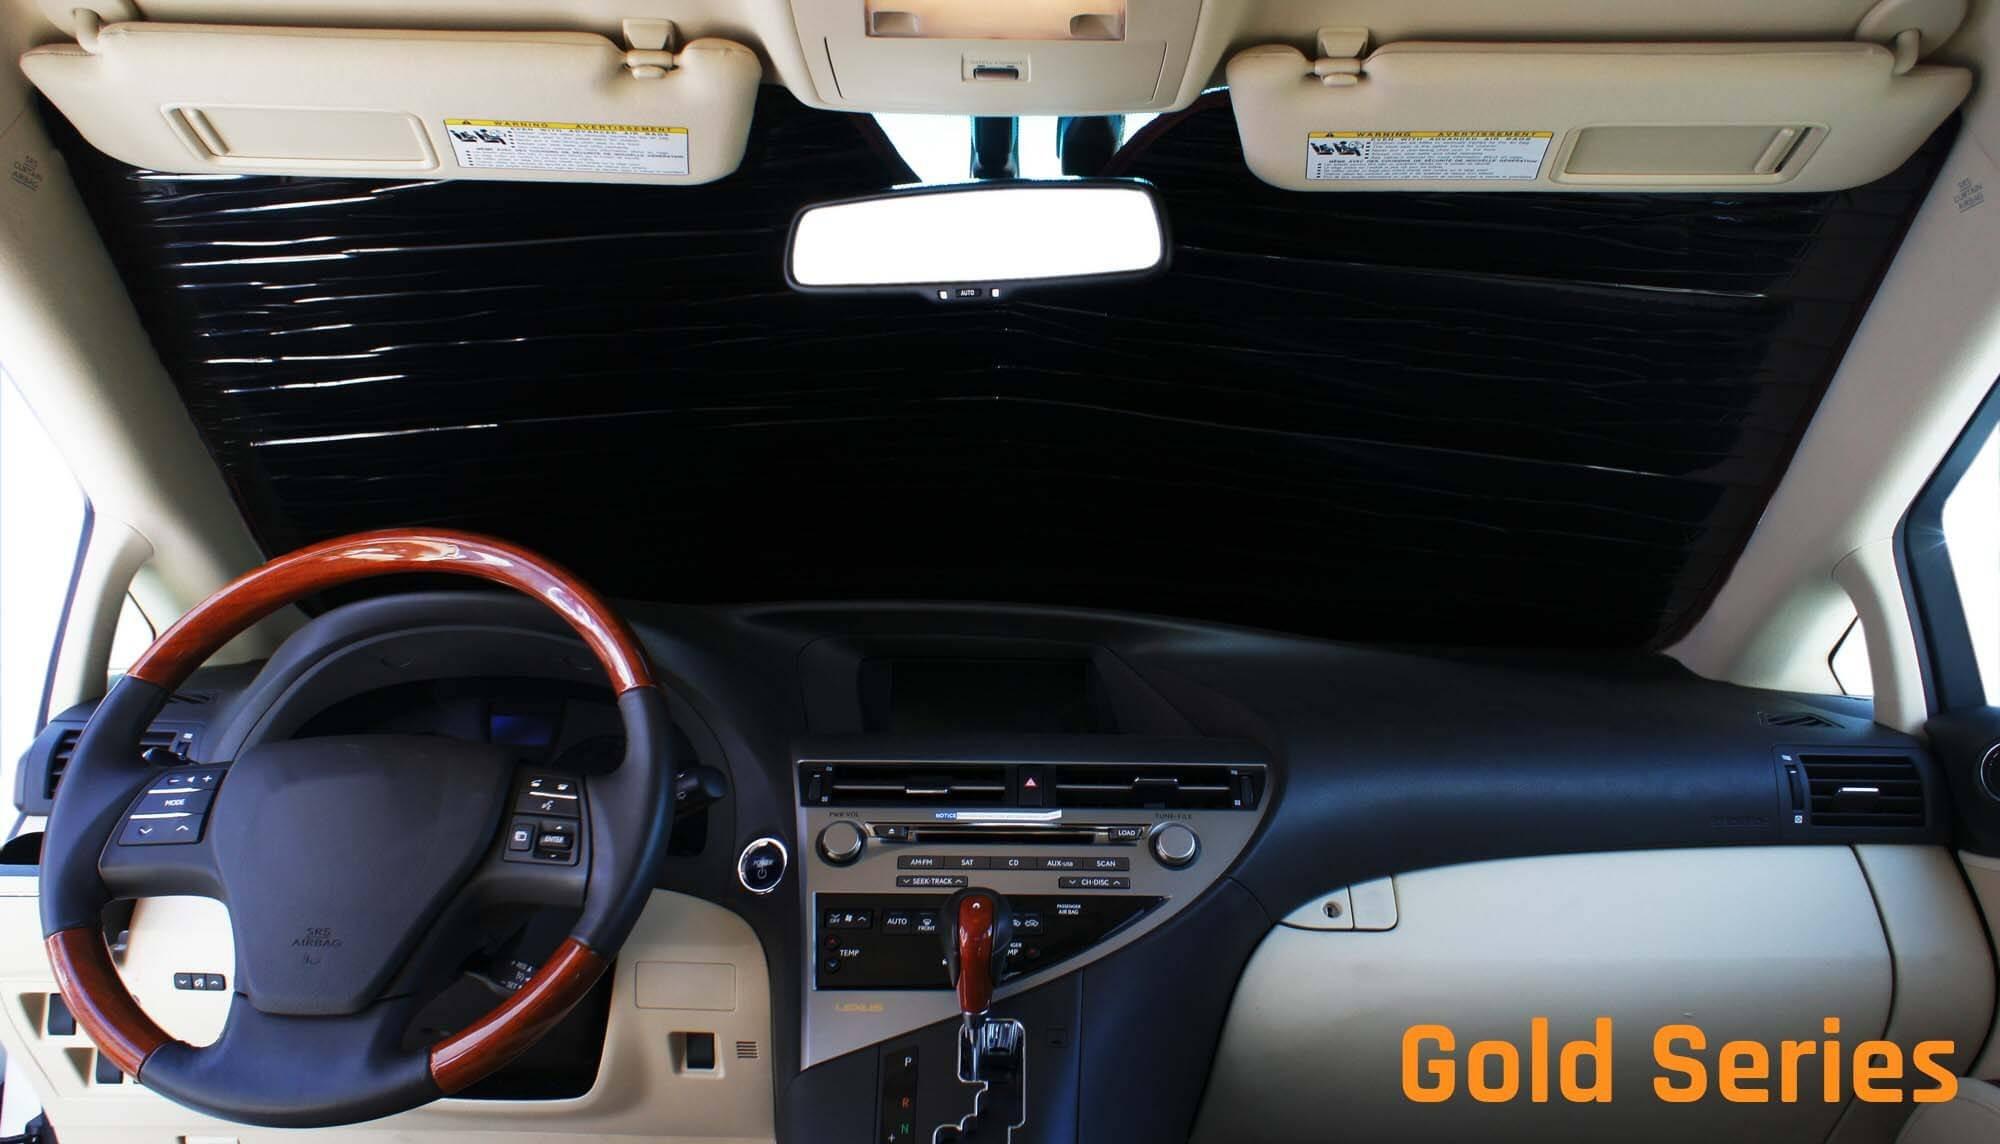 HeatShield The Original Auto Sunshade, Custom-Fit for Tesla 3 Sedan 2018, Gold Series